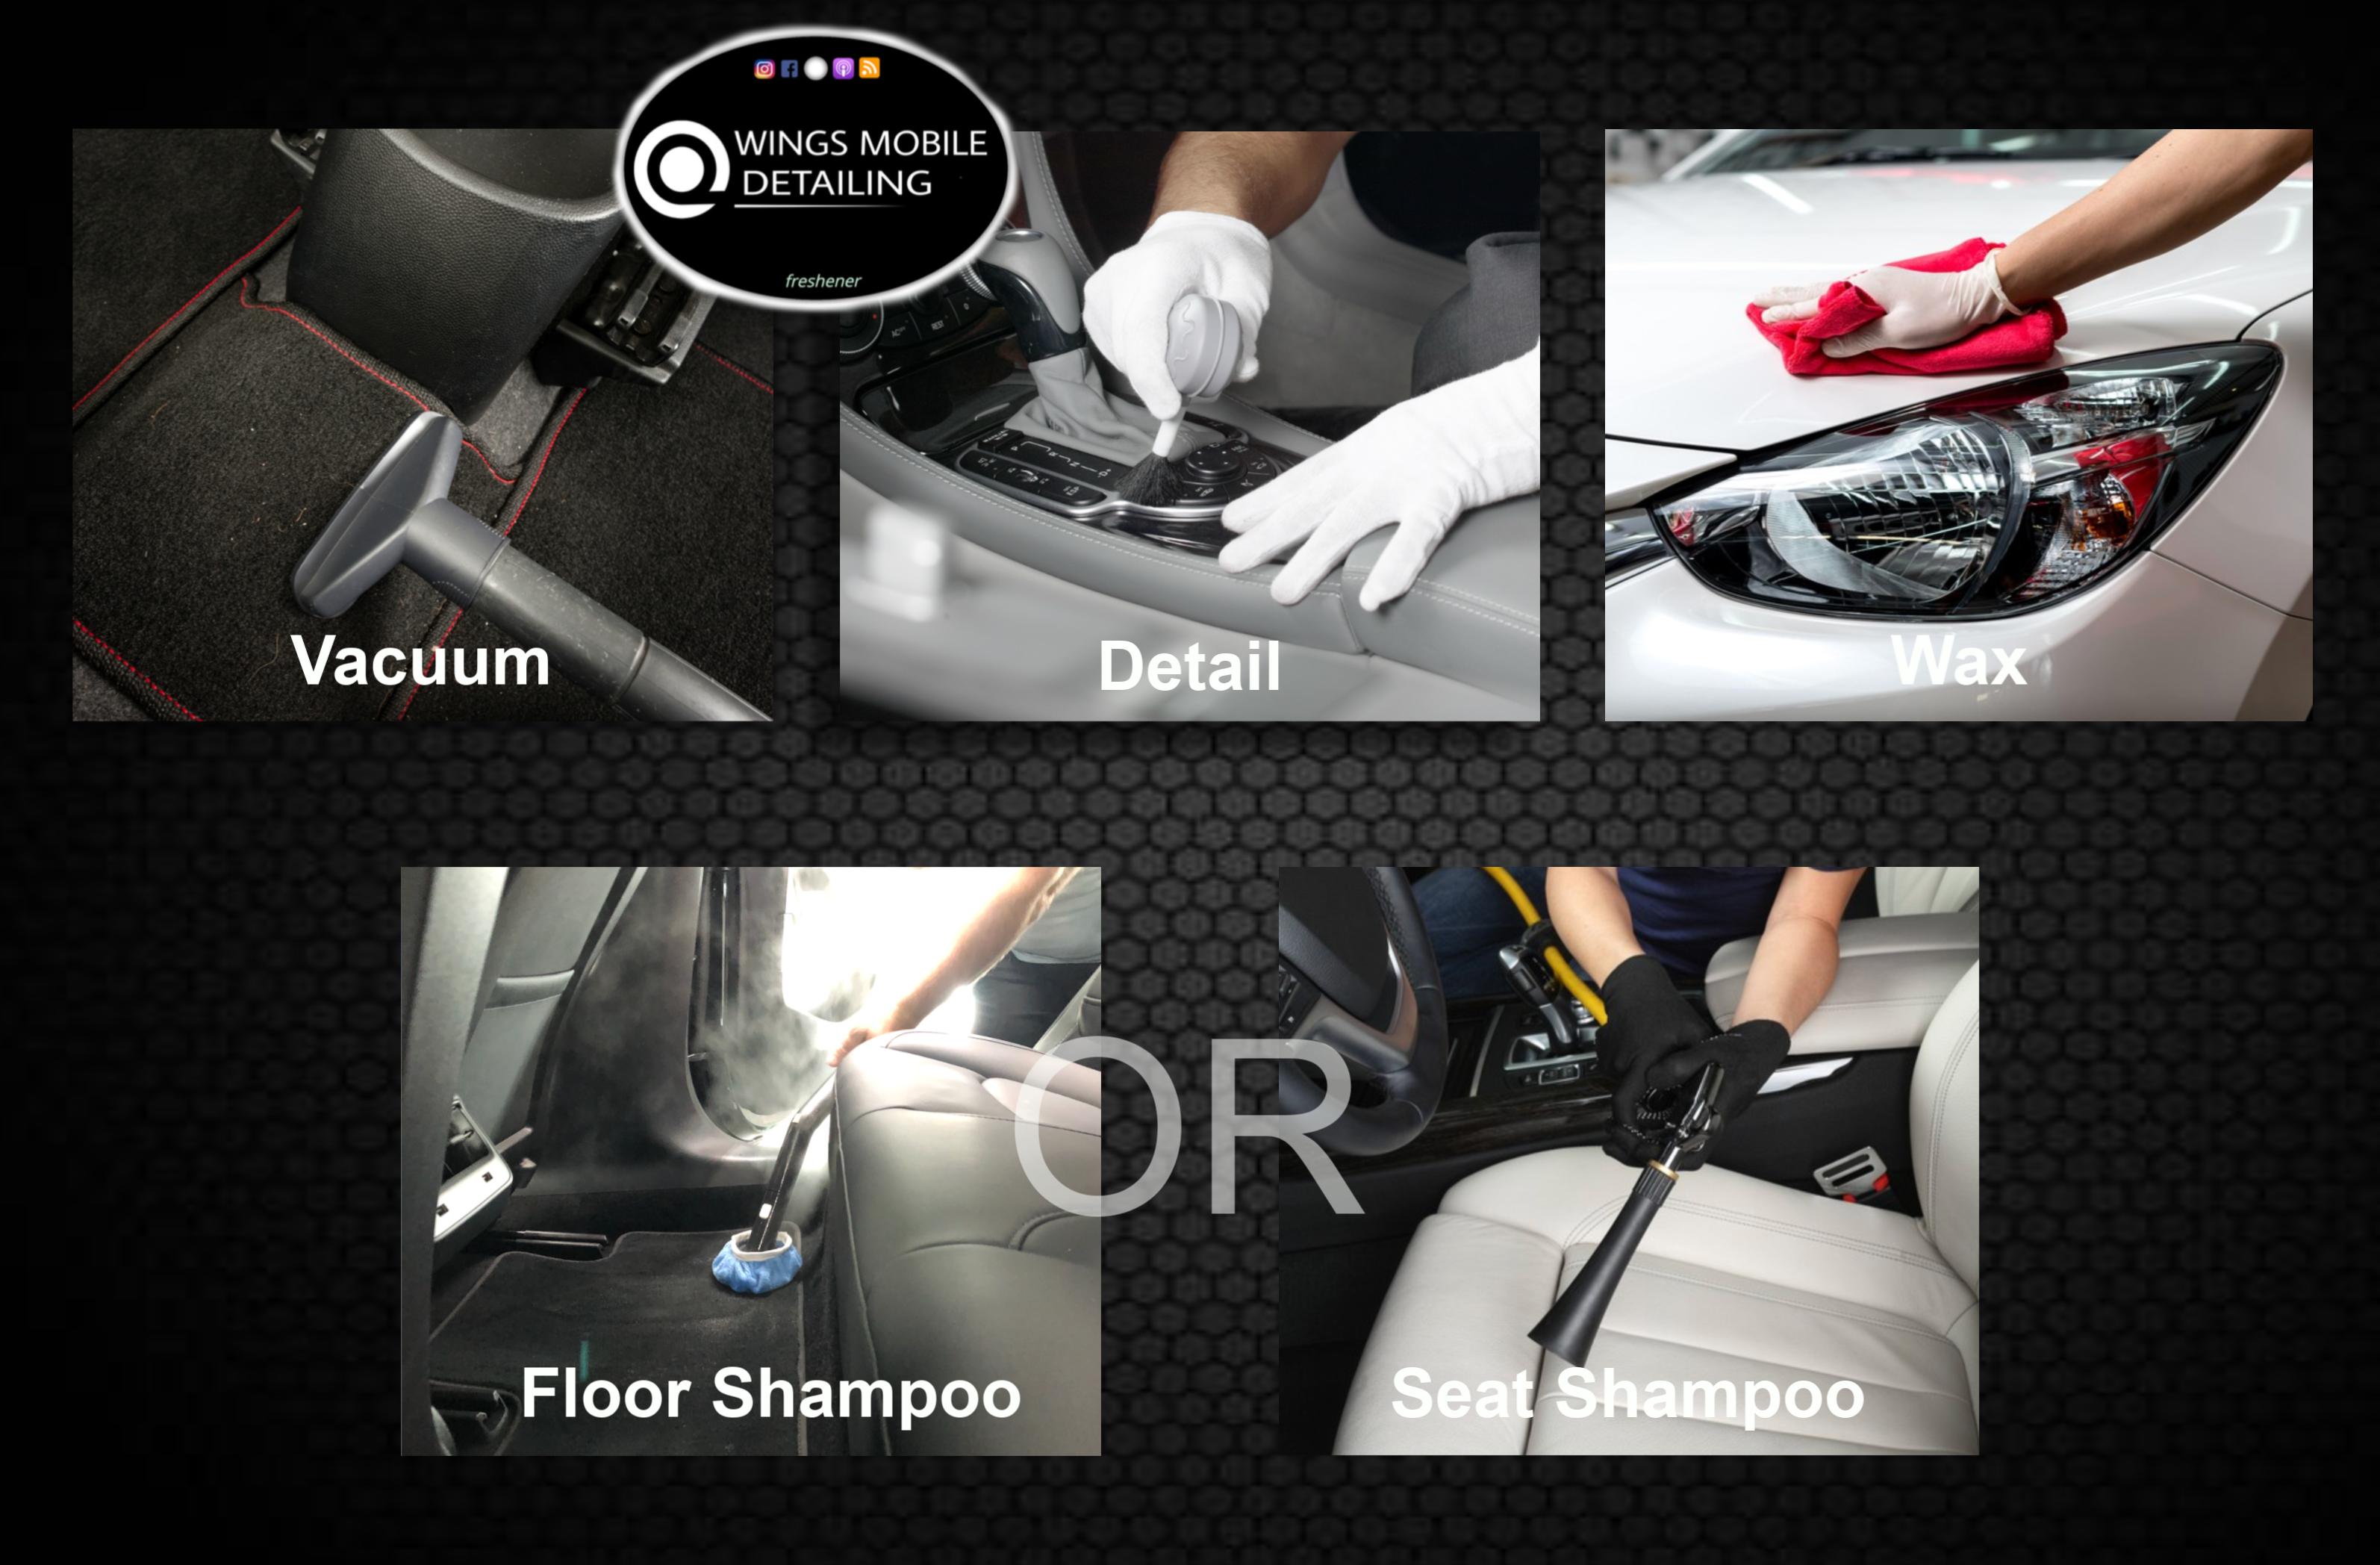 Deluxe + Seat Or Floor Shampoo